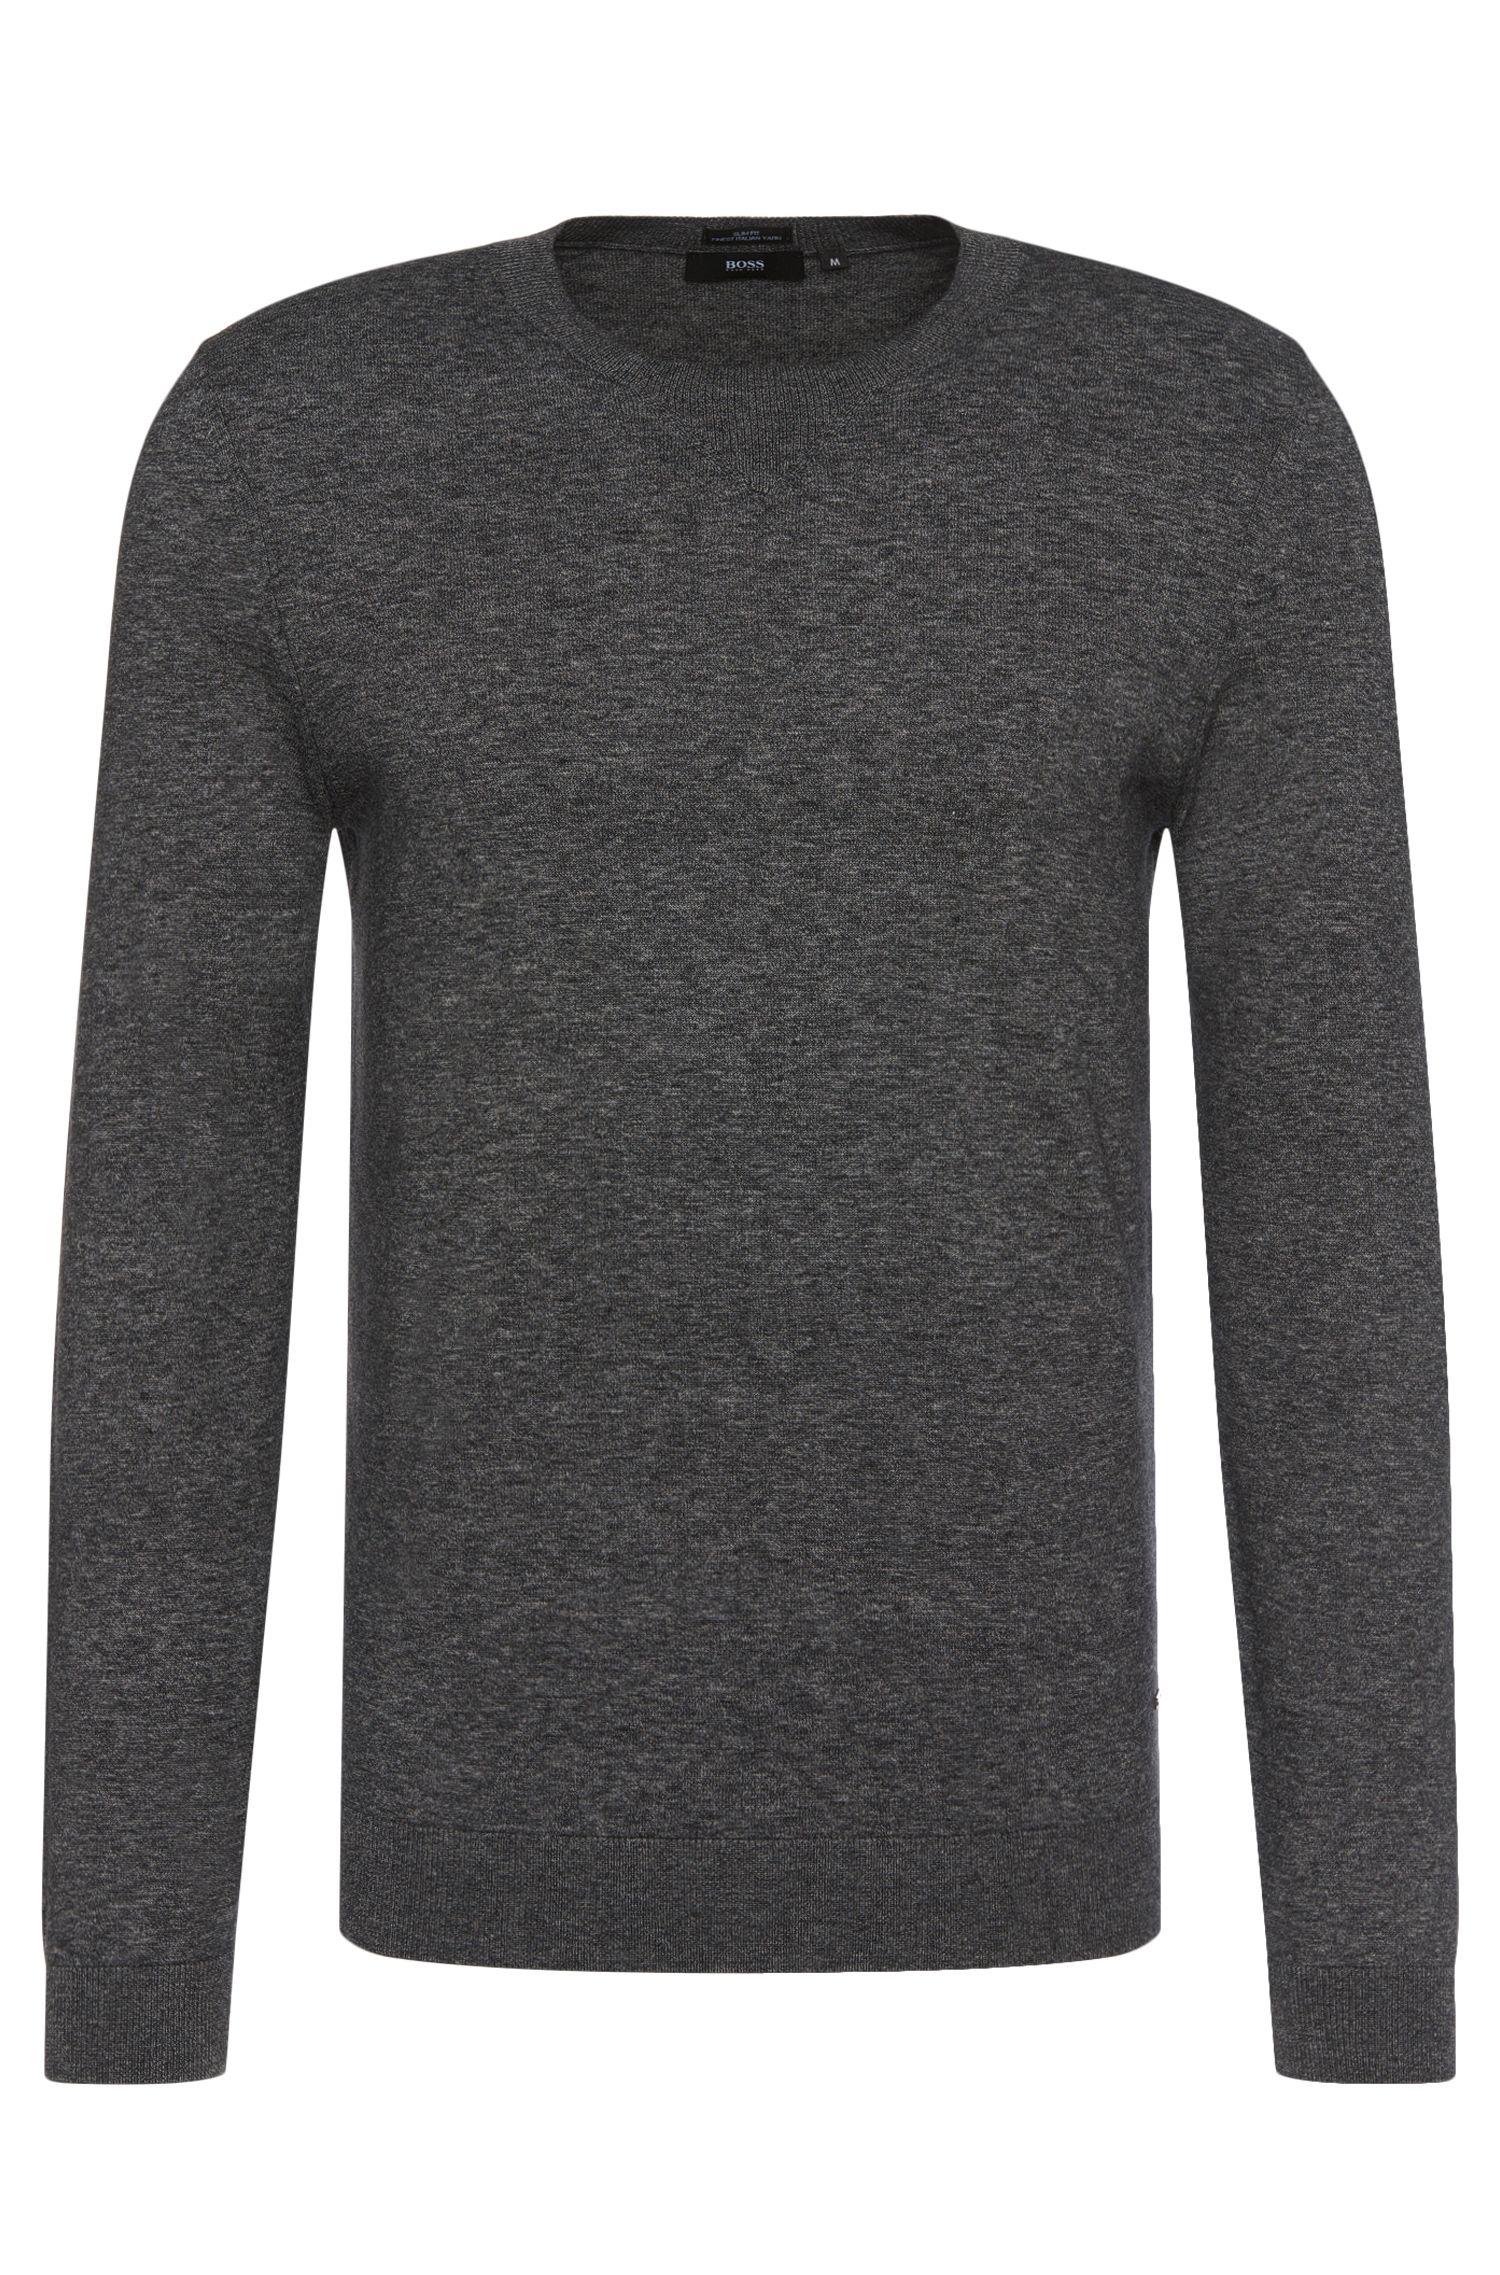 Melierter Slim-Fit Pullover aus Baumwolle: 'Ives'